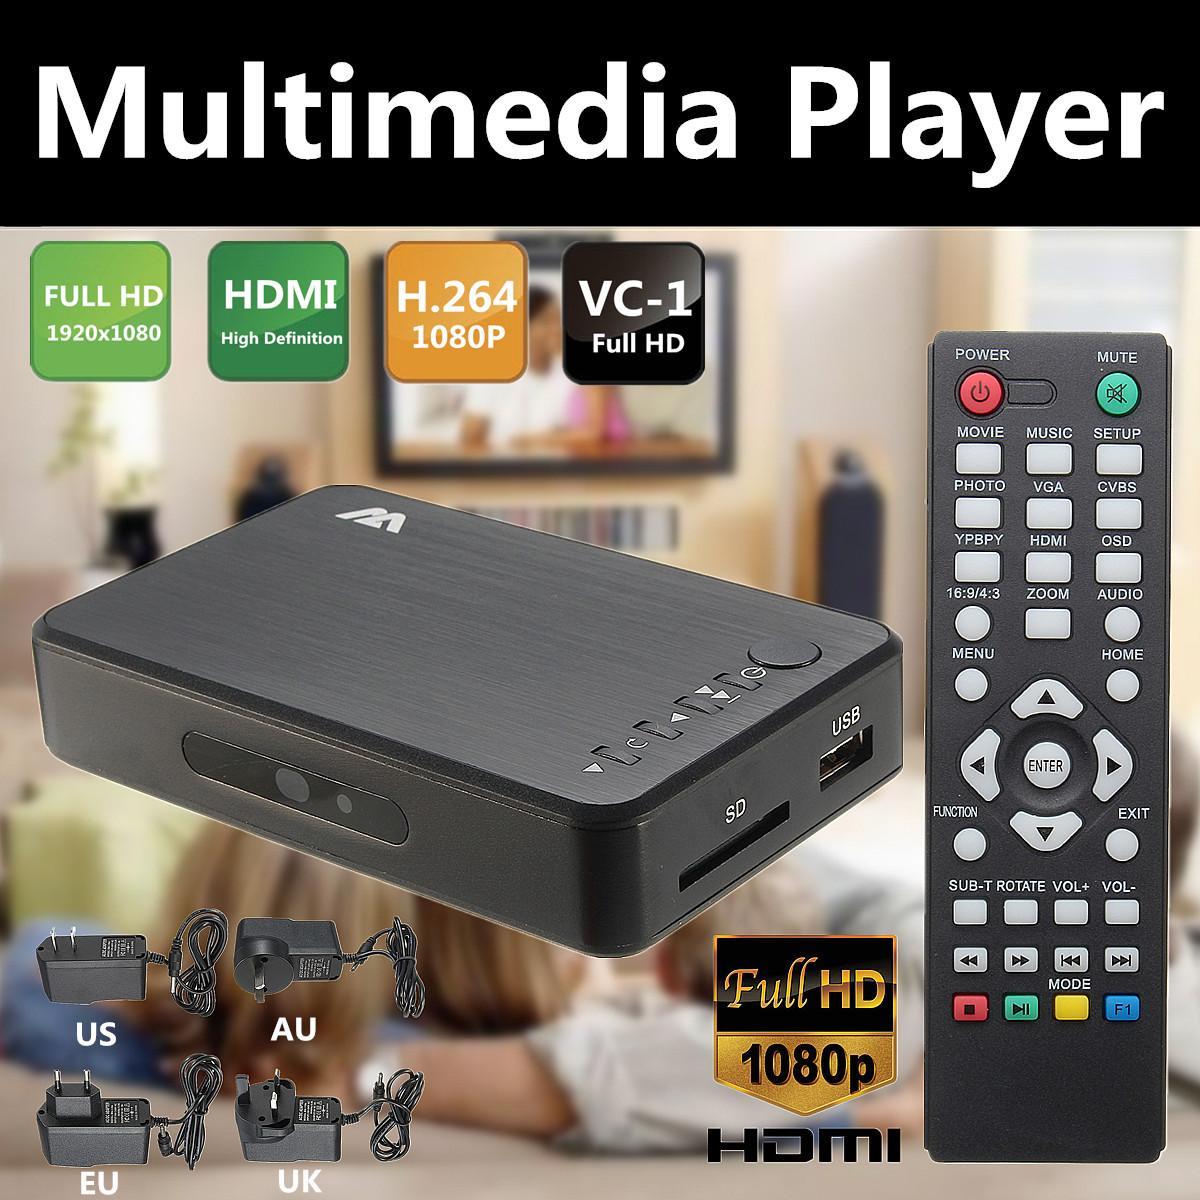 Lecteur multimédia Full 1080P HD HDMI/VGA/AV avec télécommande boîtier TV 3 FAT32 NTFS sortie EU/UK/US/AU Installation facile Portable